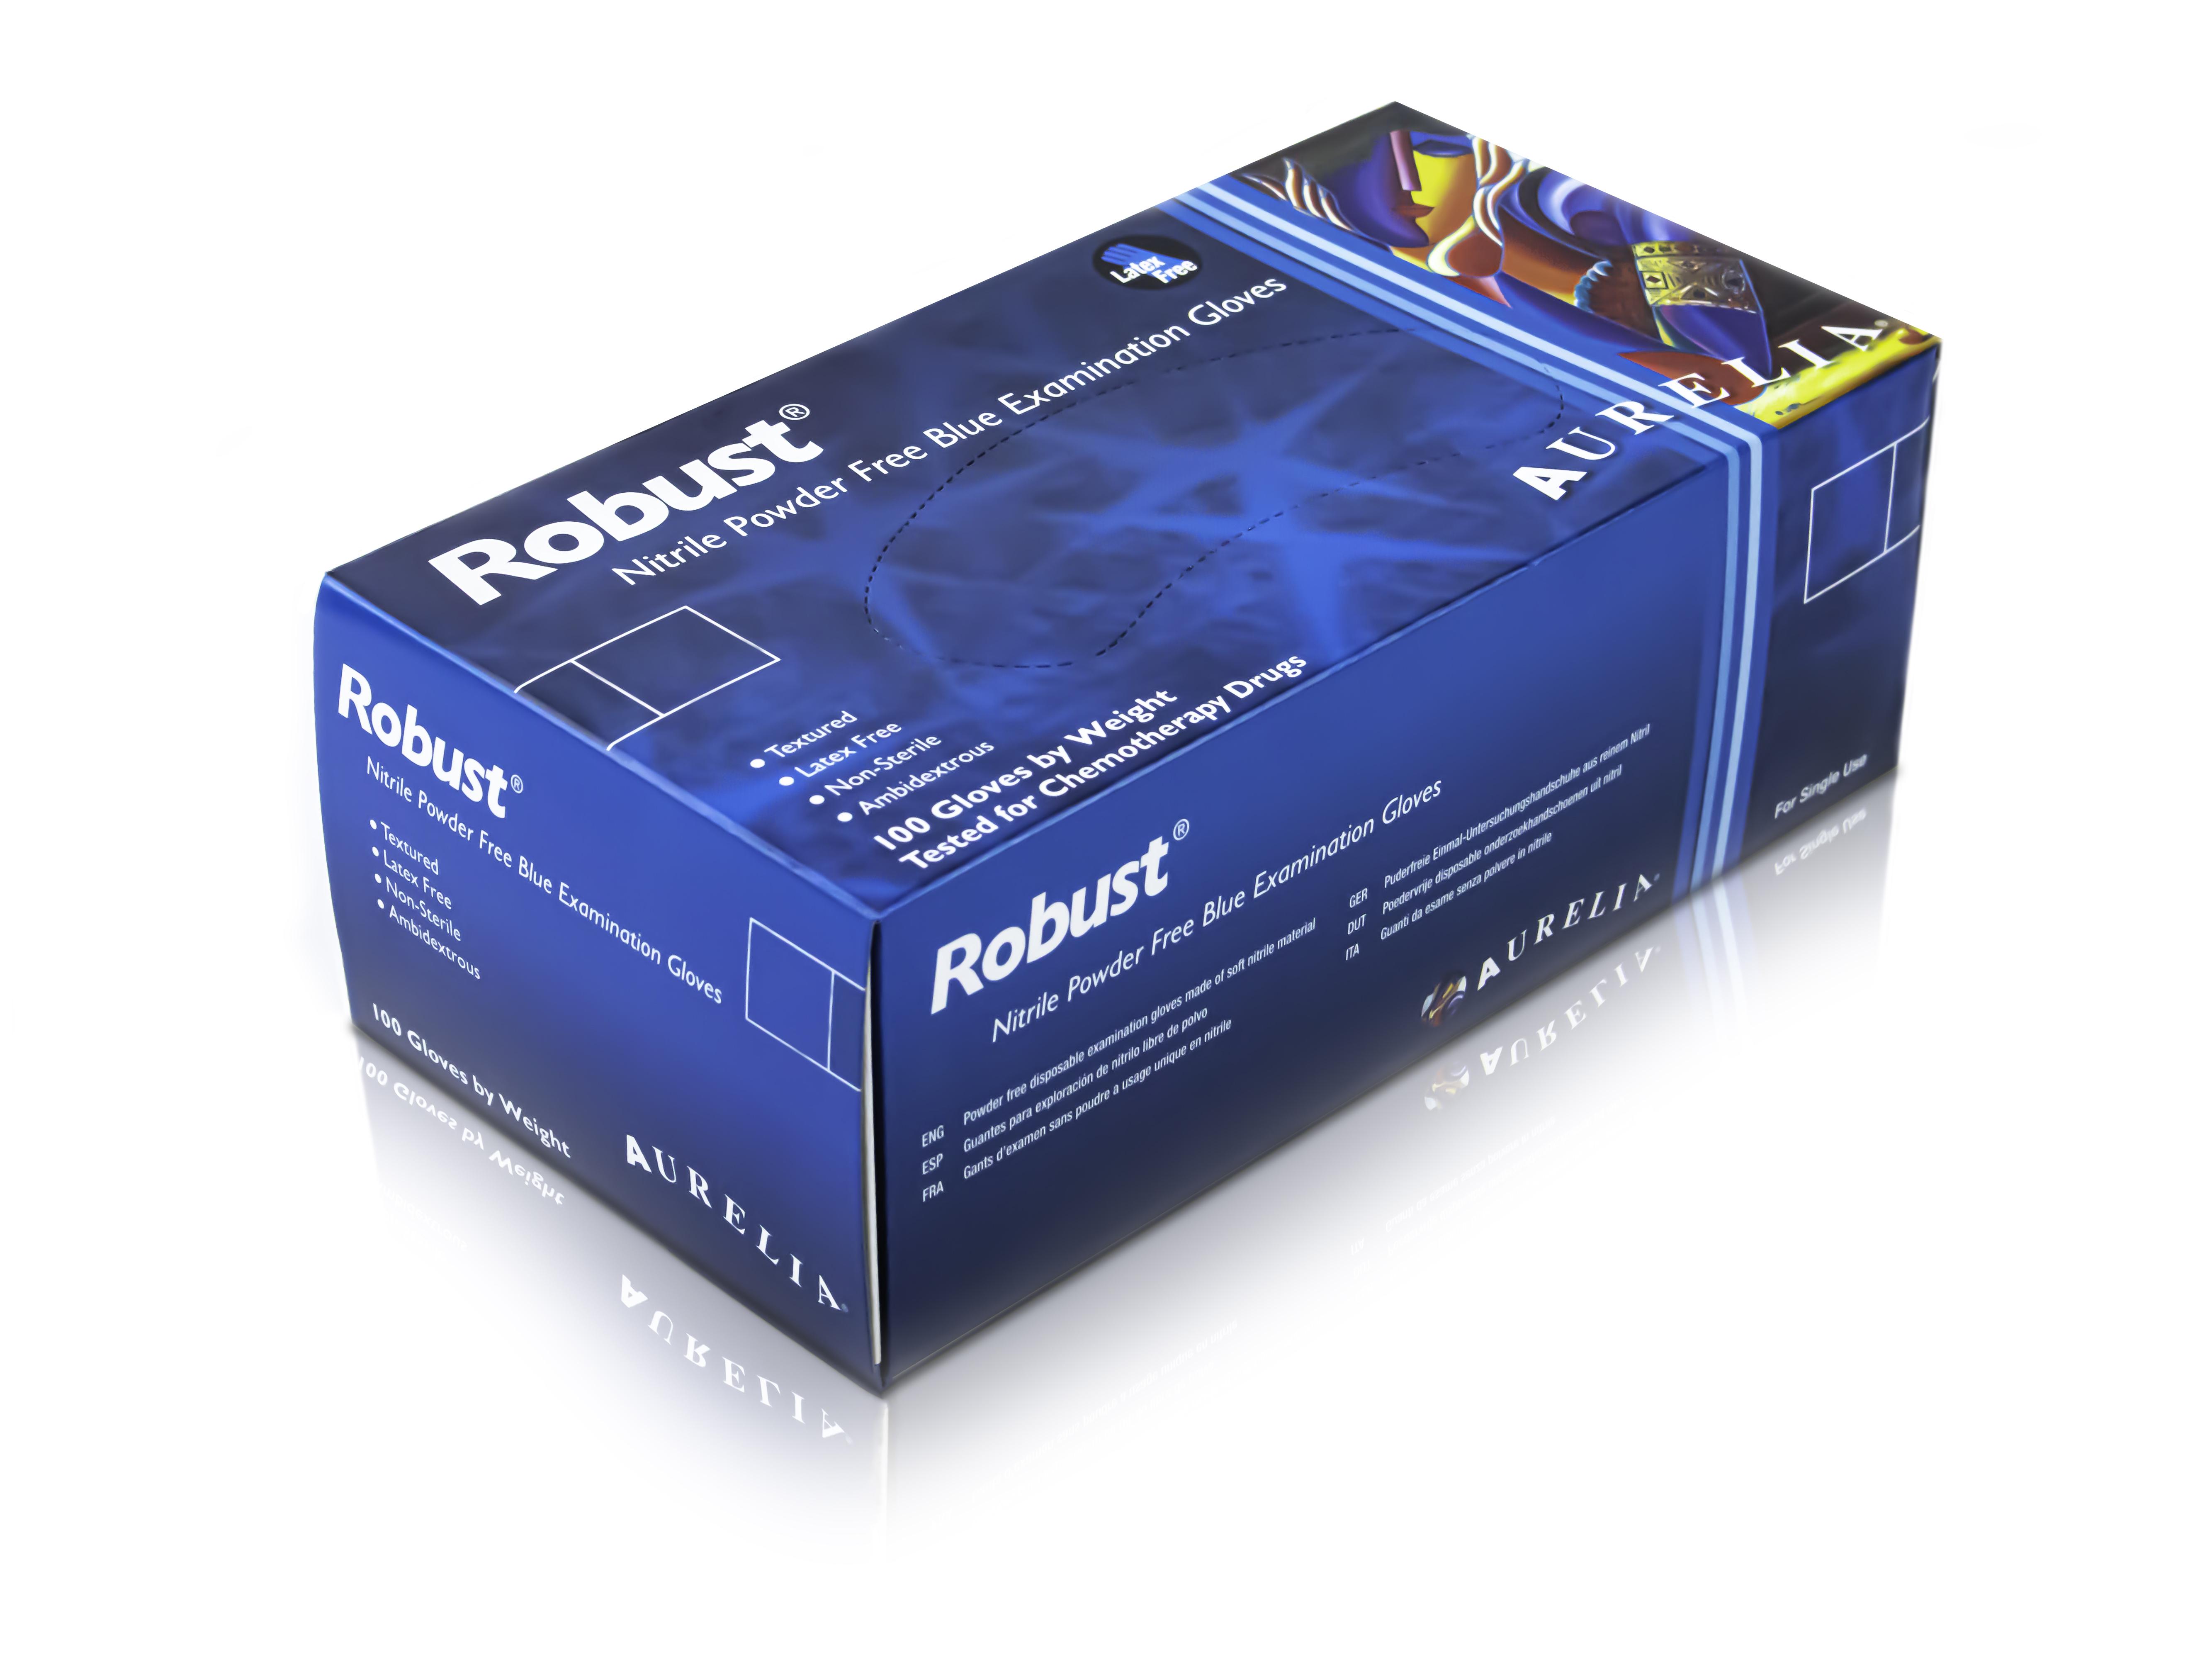 Robust®